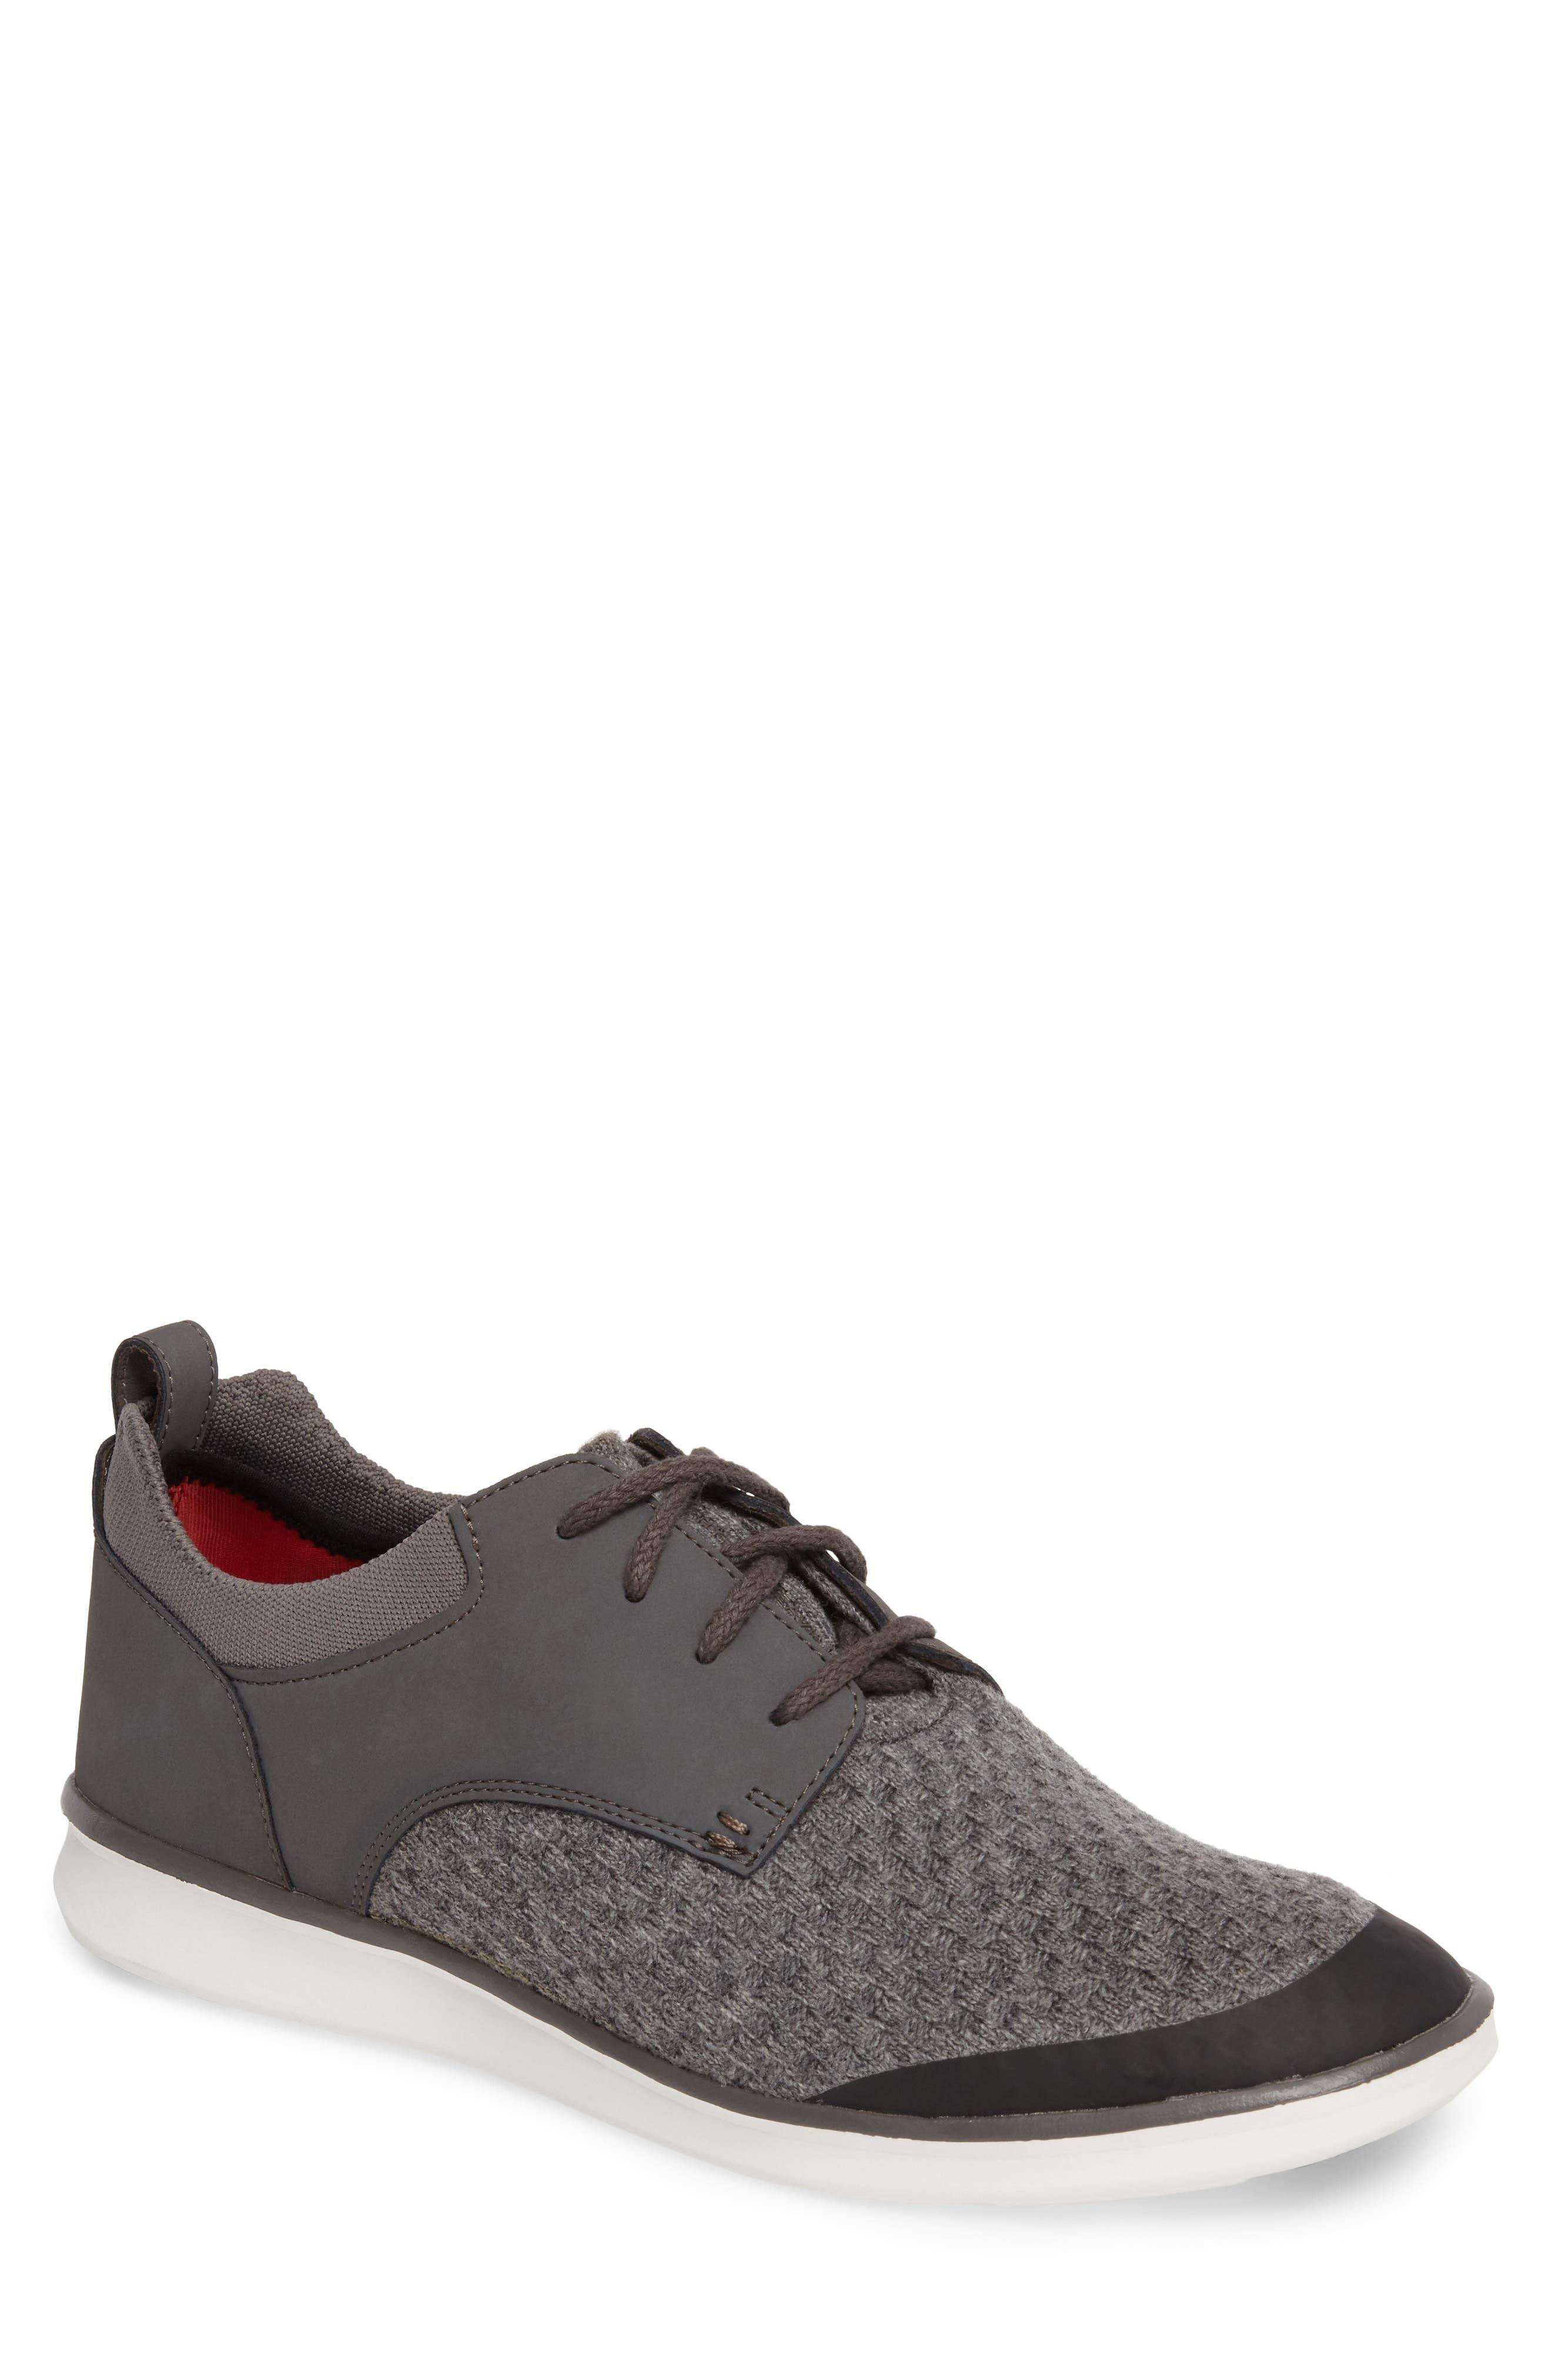 Hepner HyperWeave Sneaker,                             Main thumbnail 1, color,                             Dark Charcoal